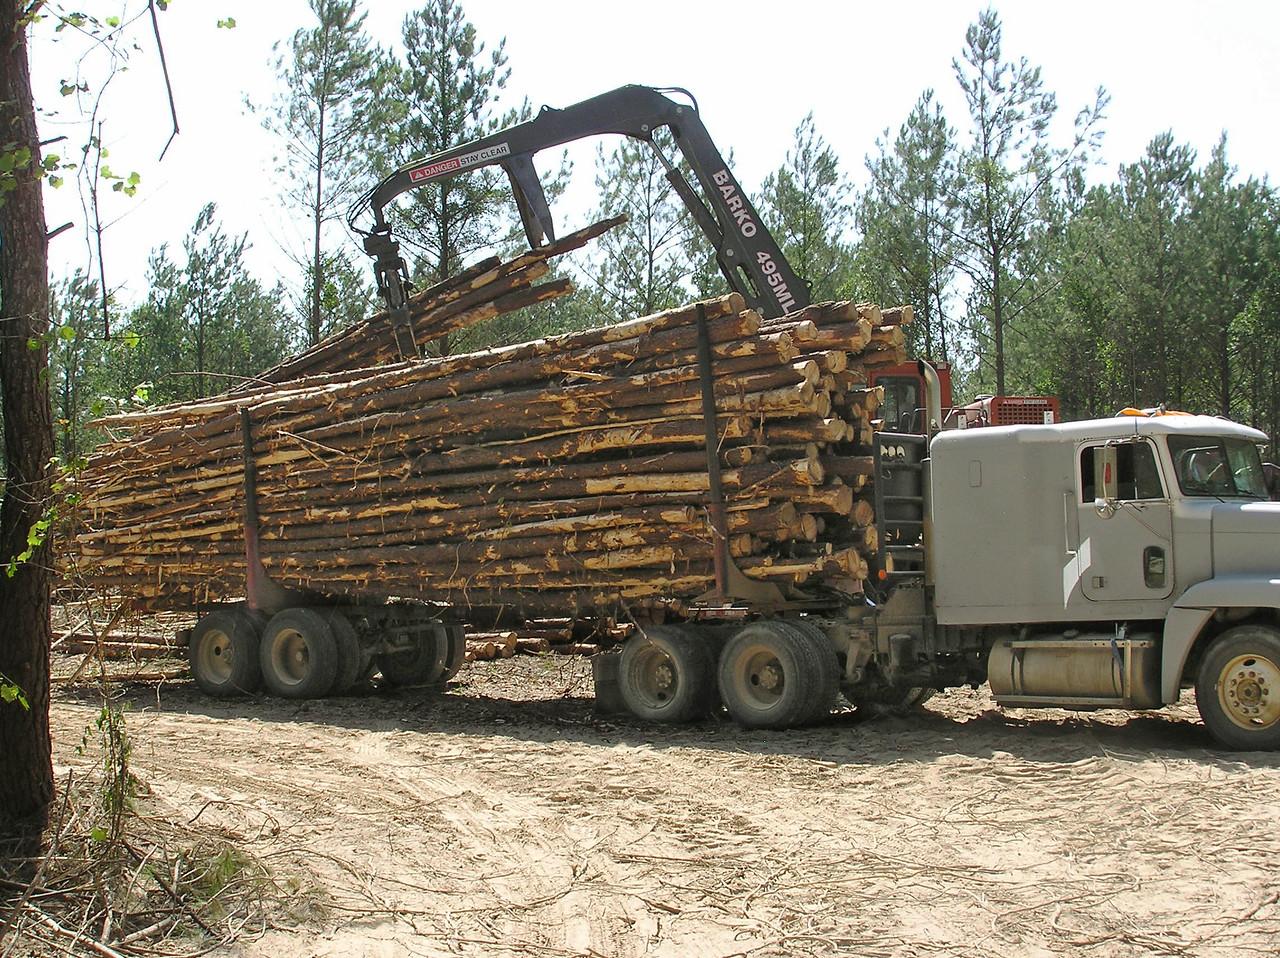 NewOrleans_07_Texas2009-33